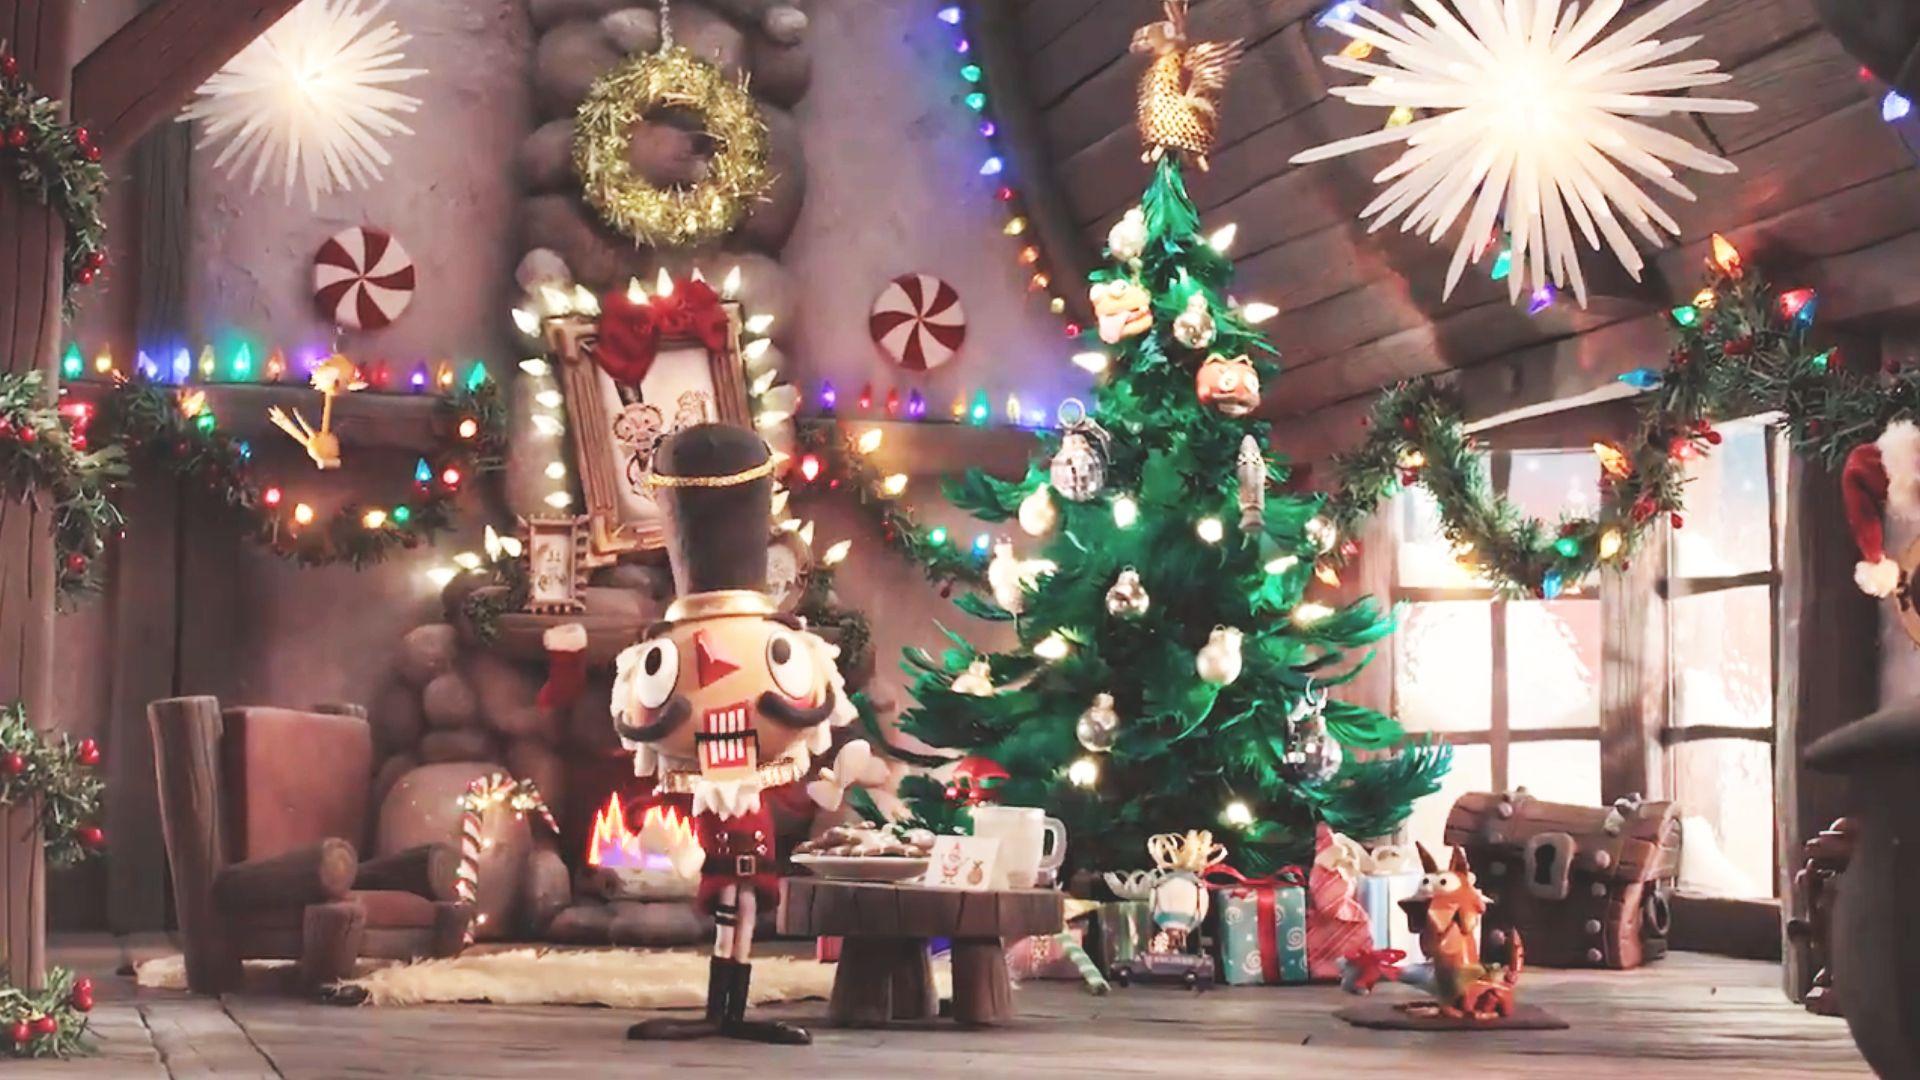 Fortnite Christmas.Crackshot Features In Fortnite S Adorable Christmas Themed